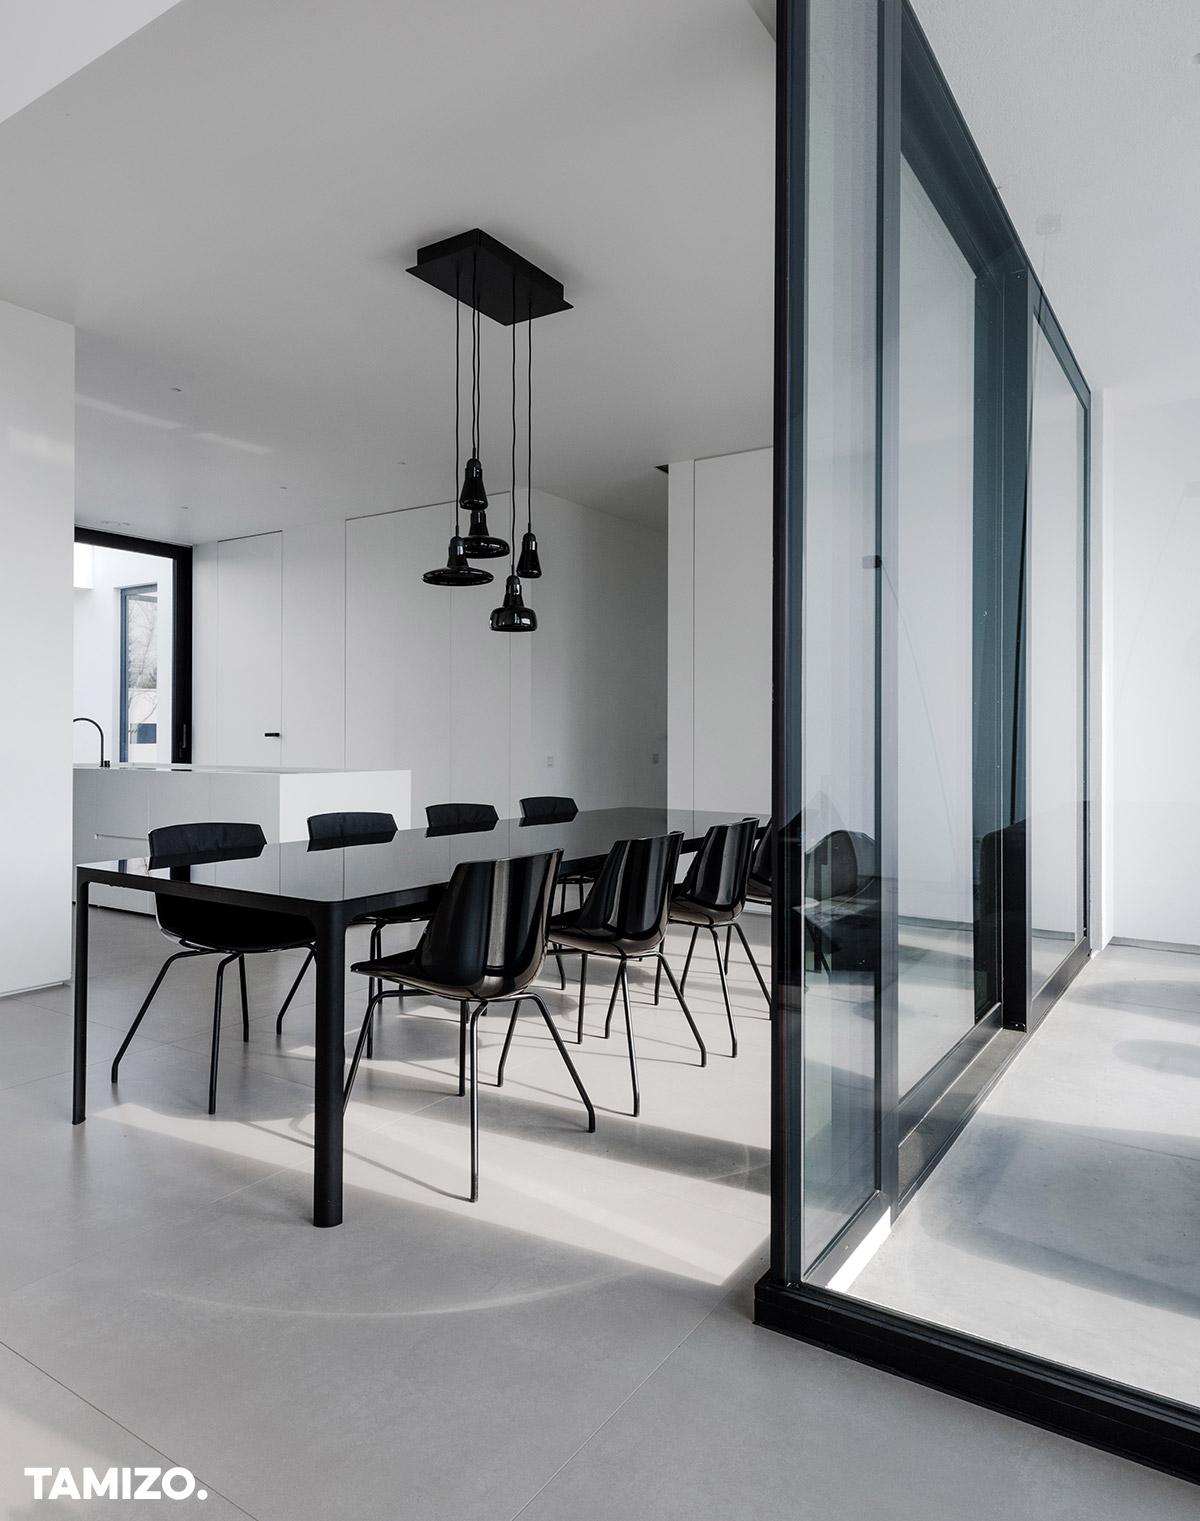 013_tamizo_architects_interior_house_realization_warsaw_poland_27